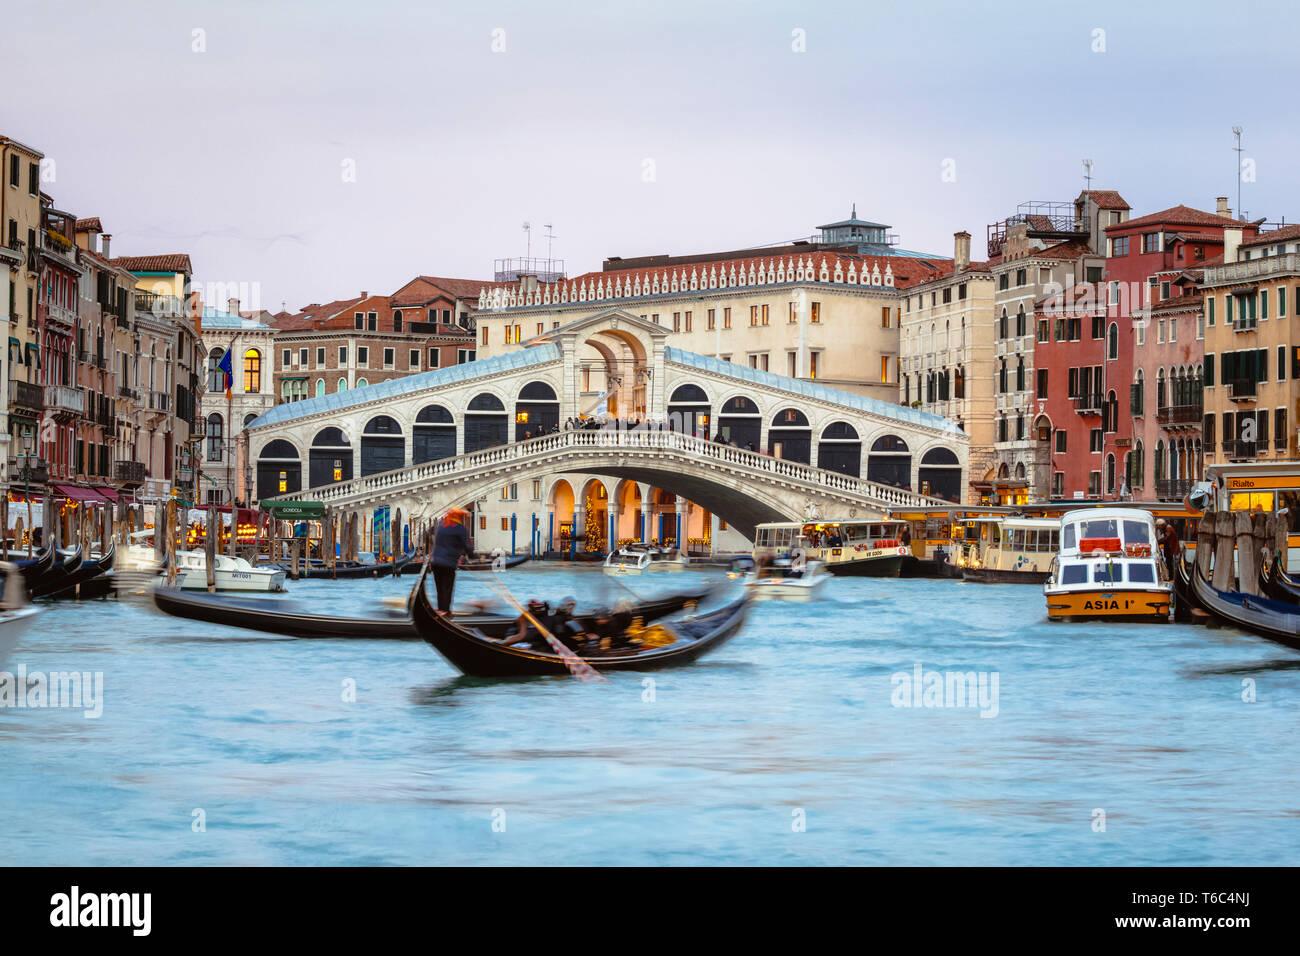 Rialto bridge on the Grand Canal at sunset, Venice, Italy Stock Photo